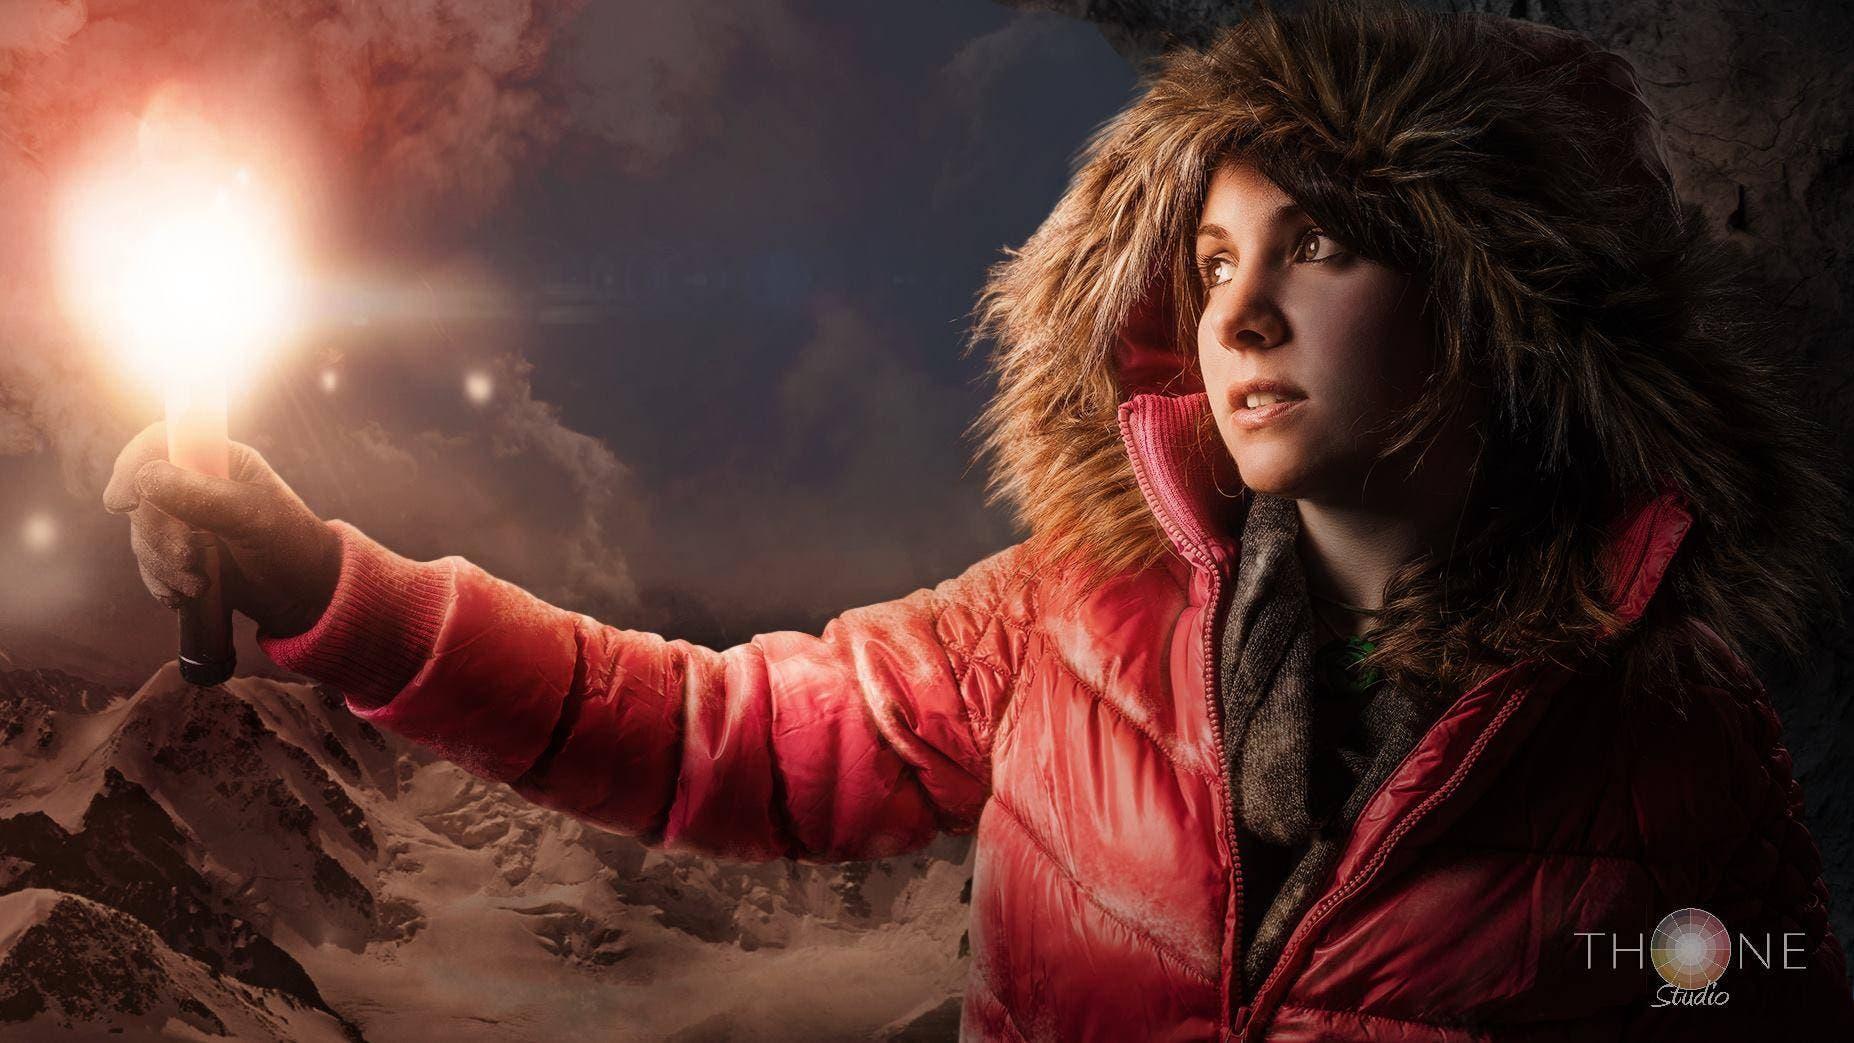 cosplay de Lara Croft rise of the tomb raider 1